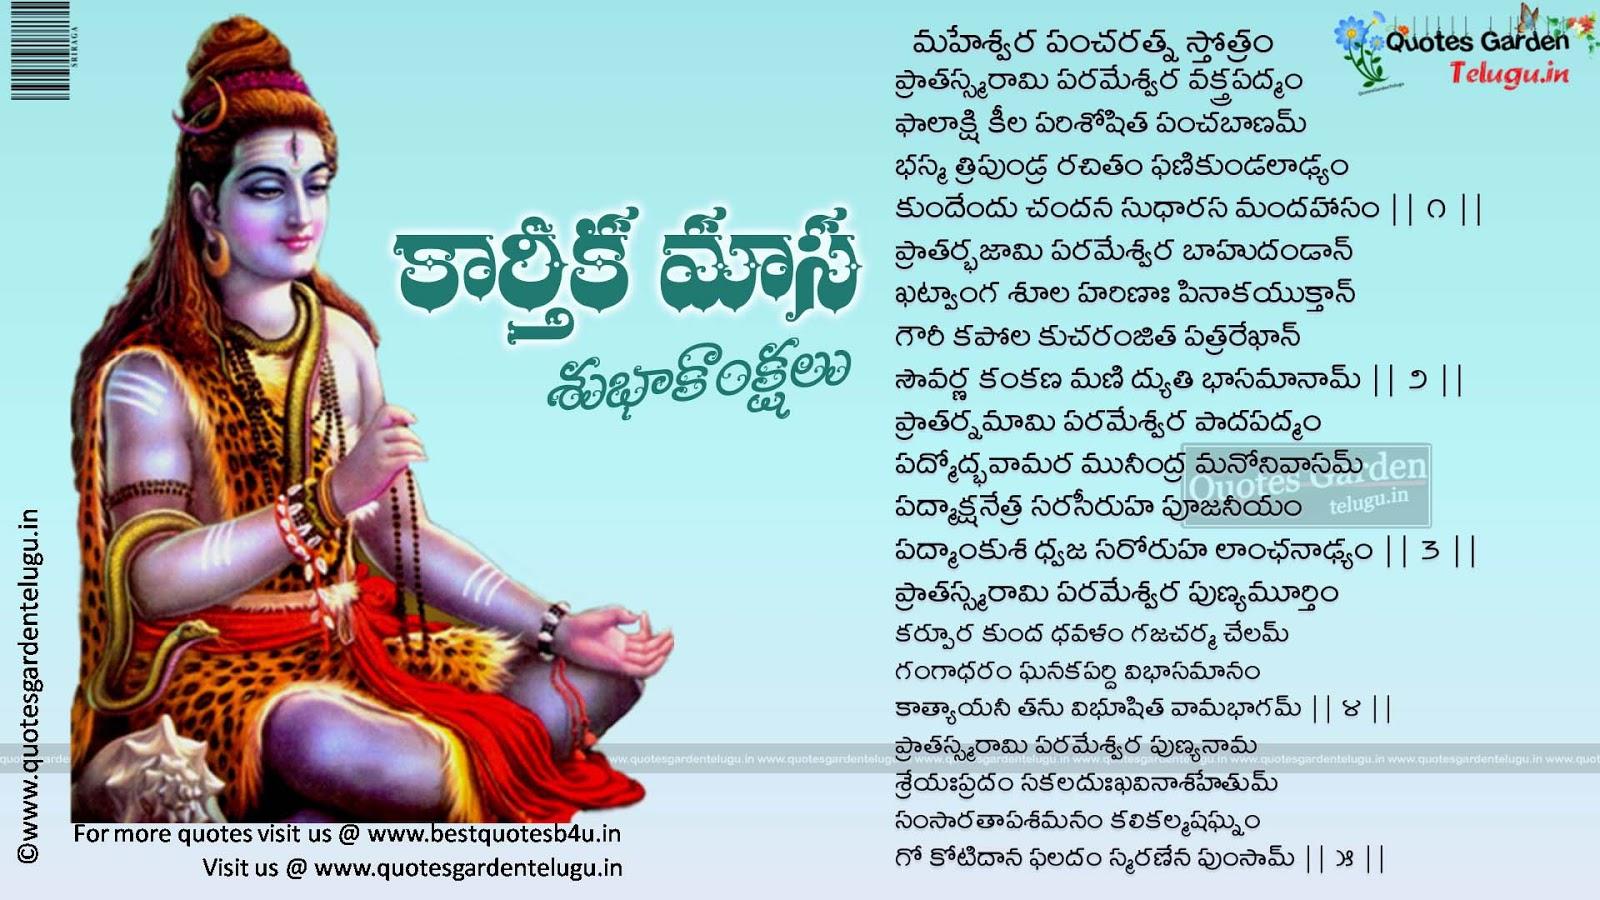 Telugu Love Quotes Hd Wallpapers Kartika Masam Greetings Pancharatna Stotram Information In